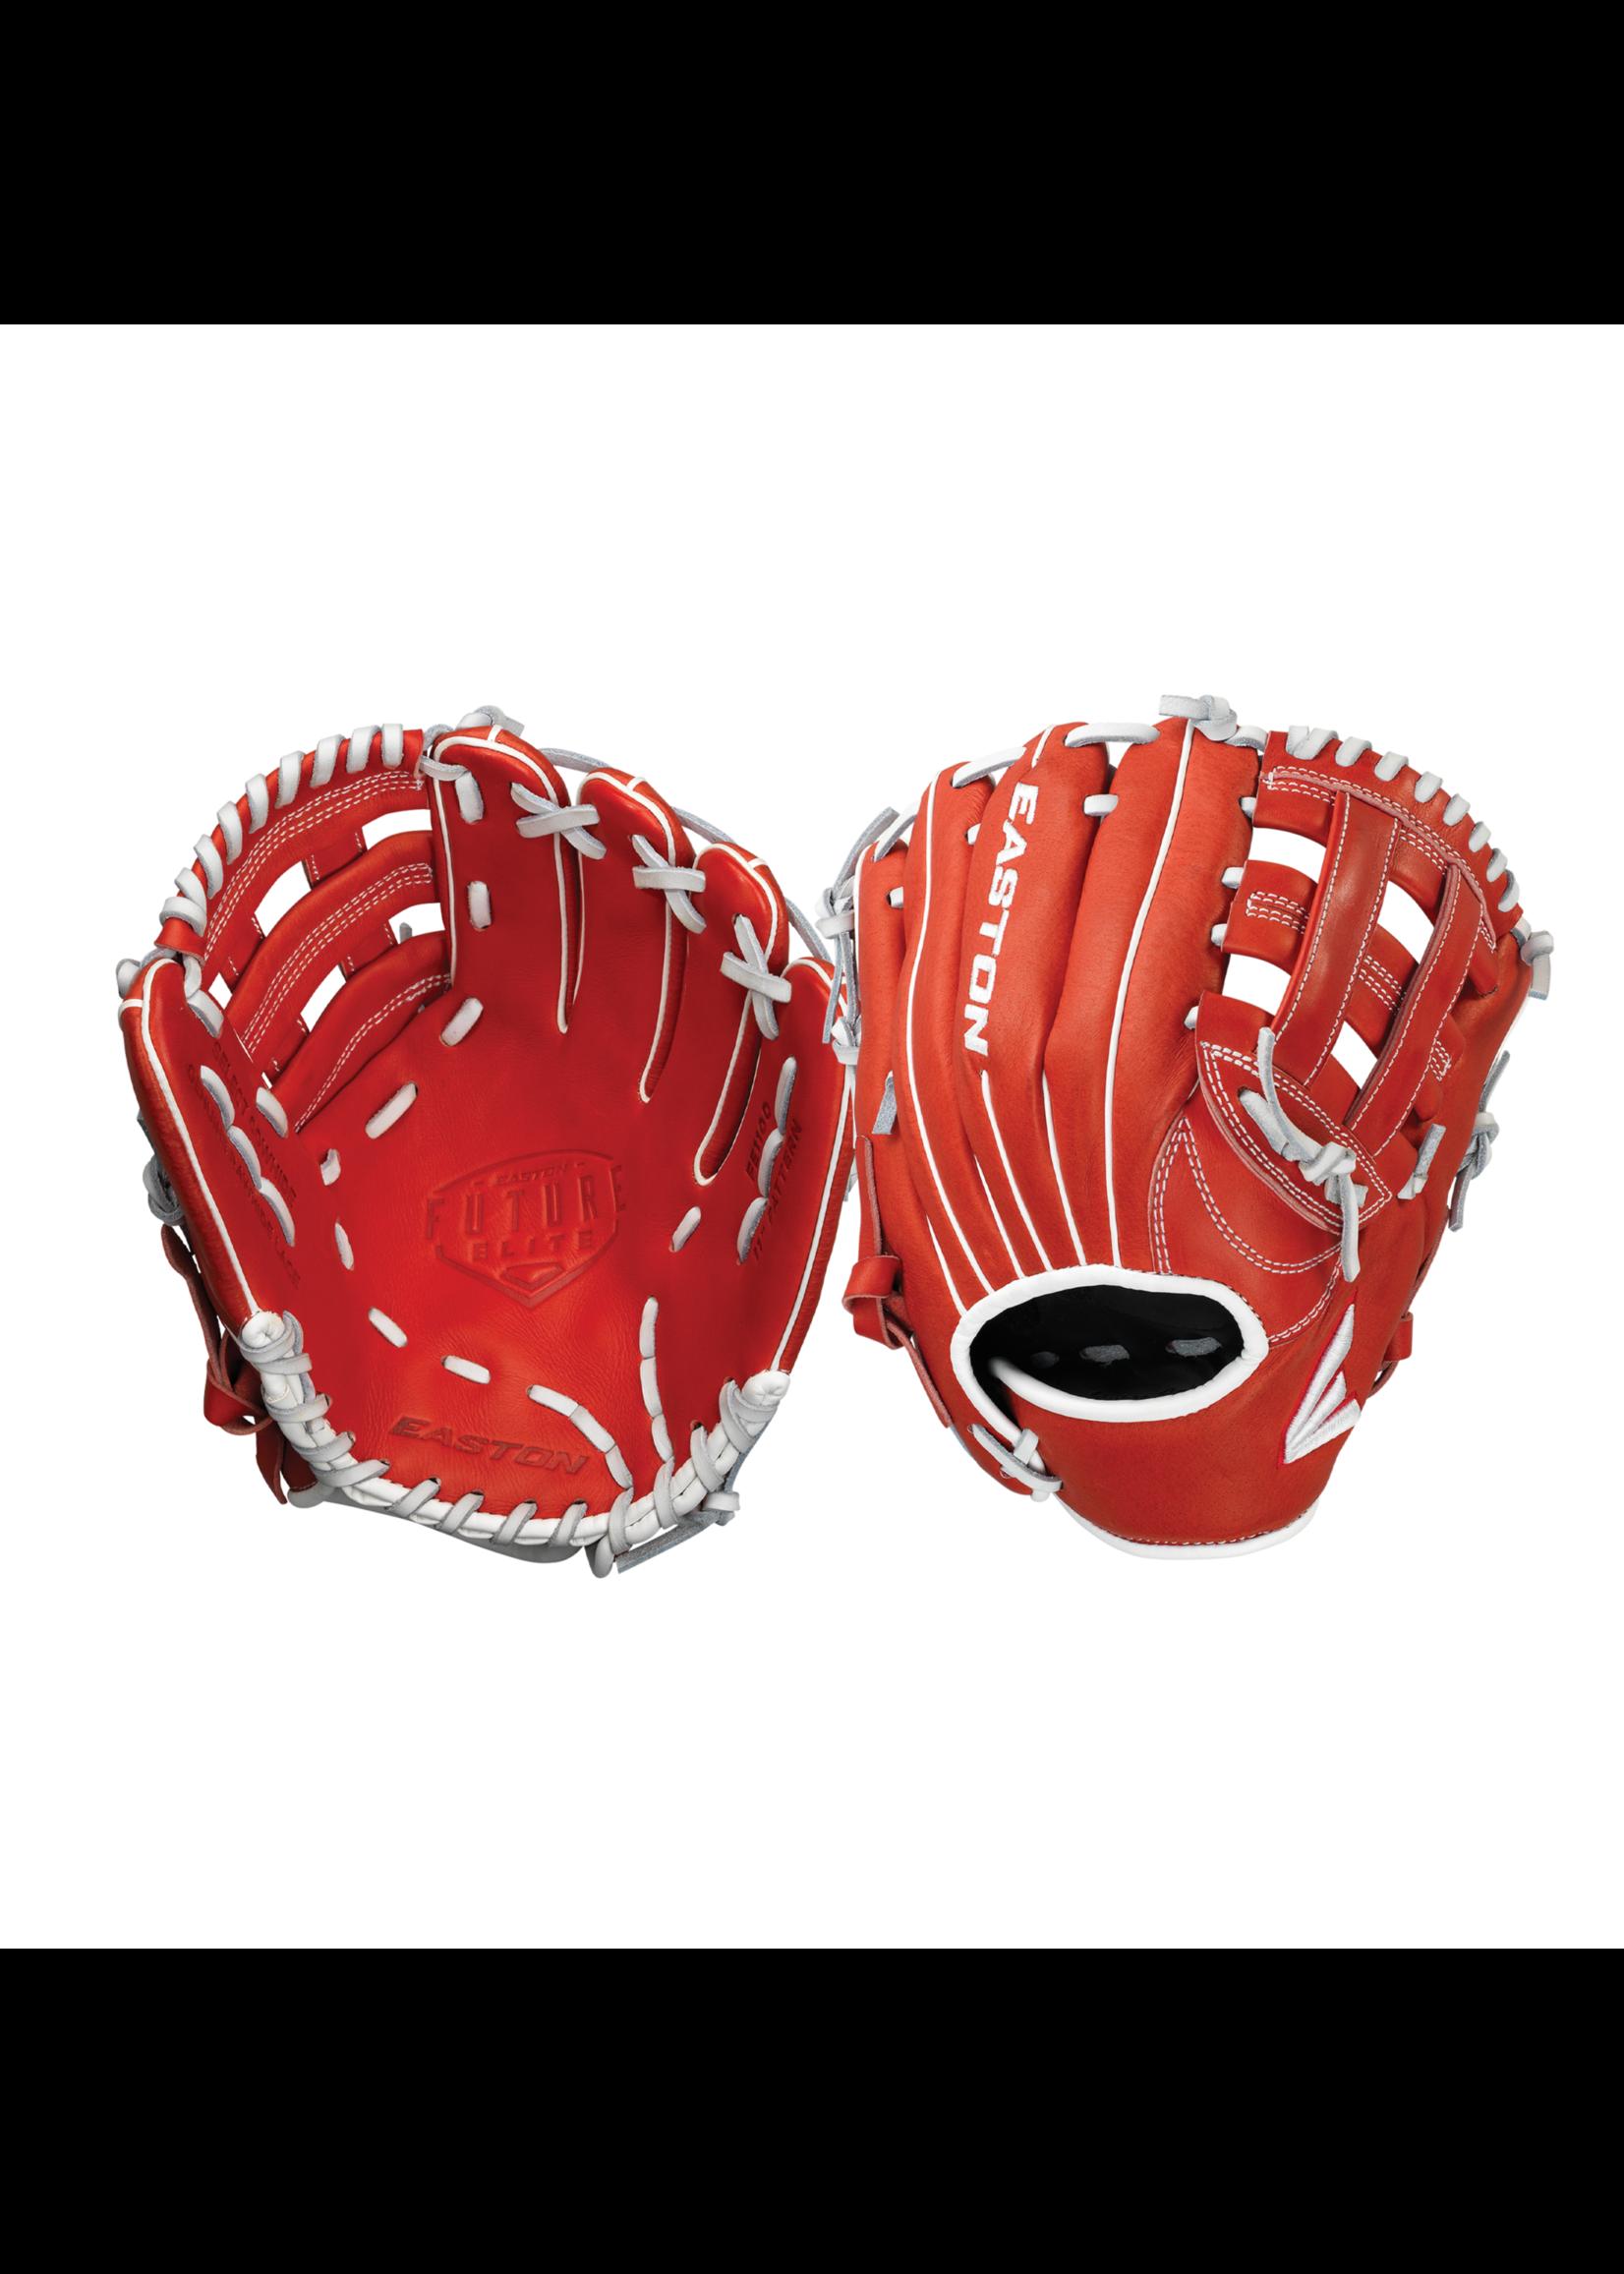 Easton Baseball (Canada) EASTON FUTURE ELITE 11'' RED YTH BASEBALL GLOVE